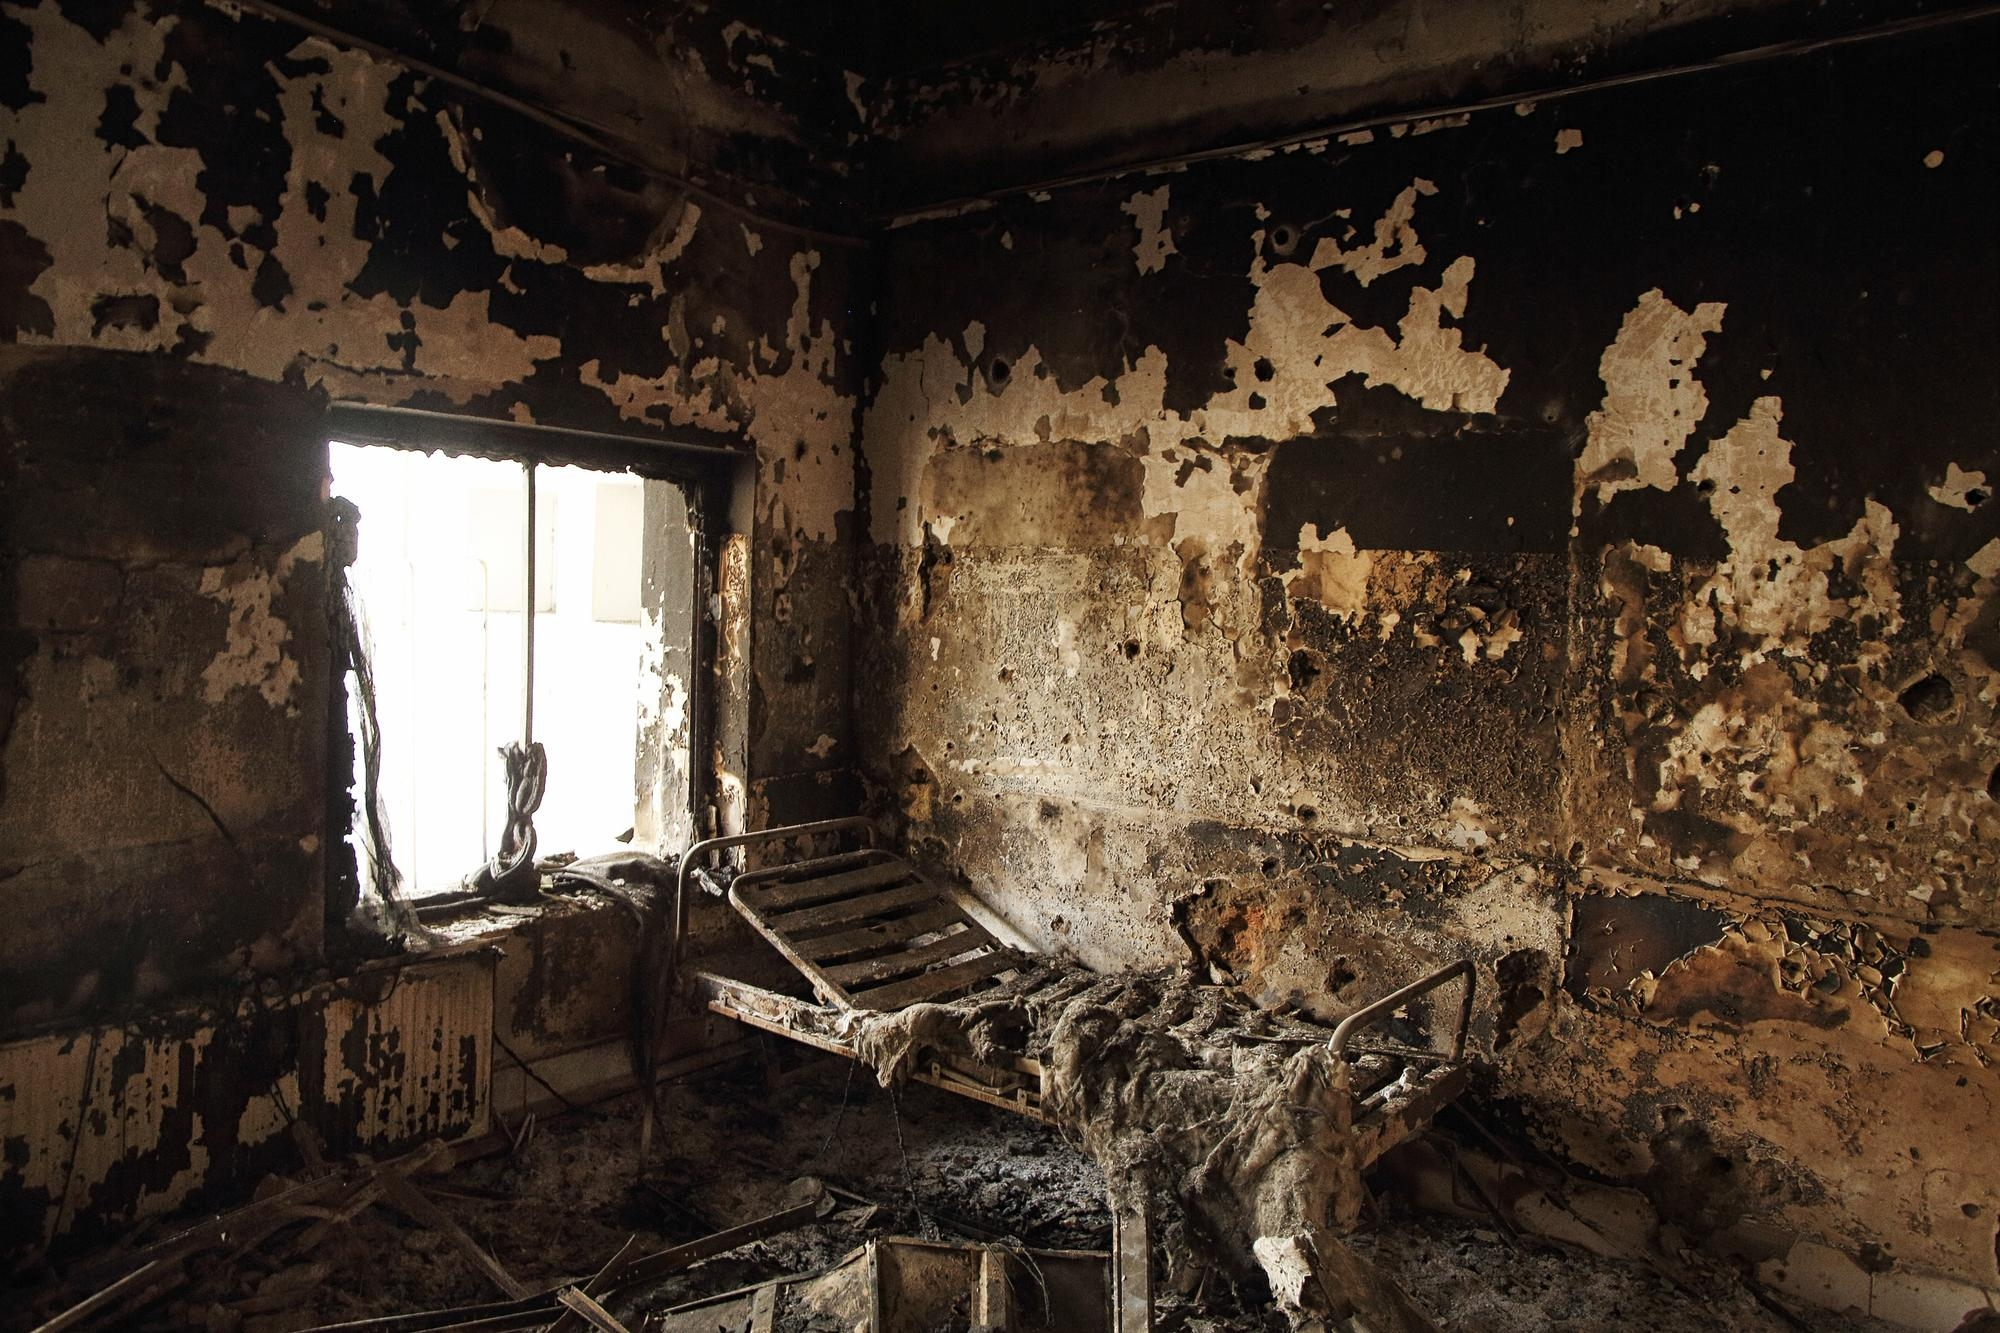 Kunduz Hospital after the U.S. bombing attack